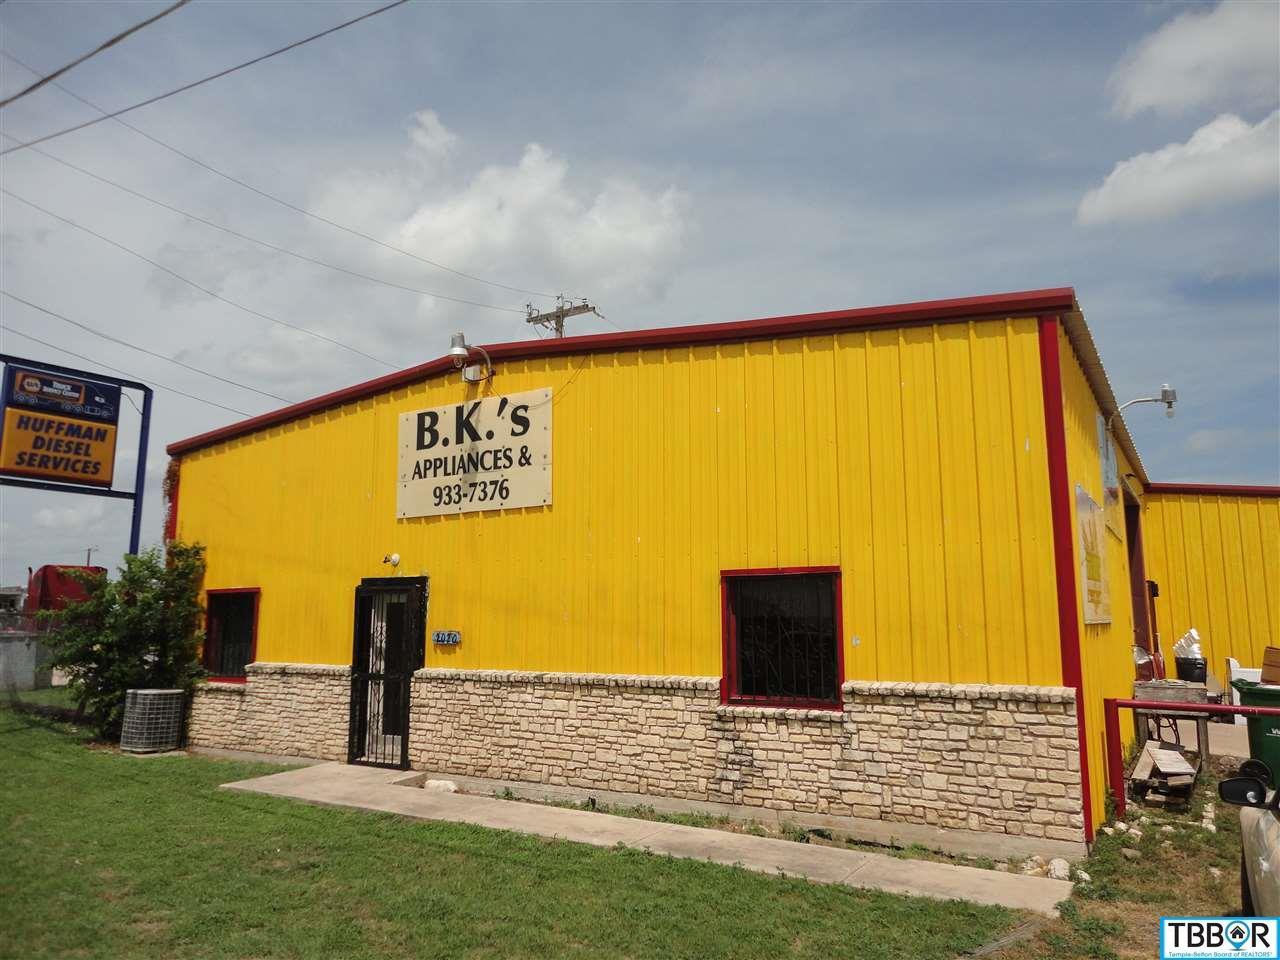 2020 S Ih 35, Belton TX 76513 - Photo 1